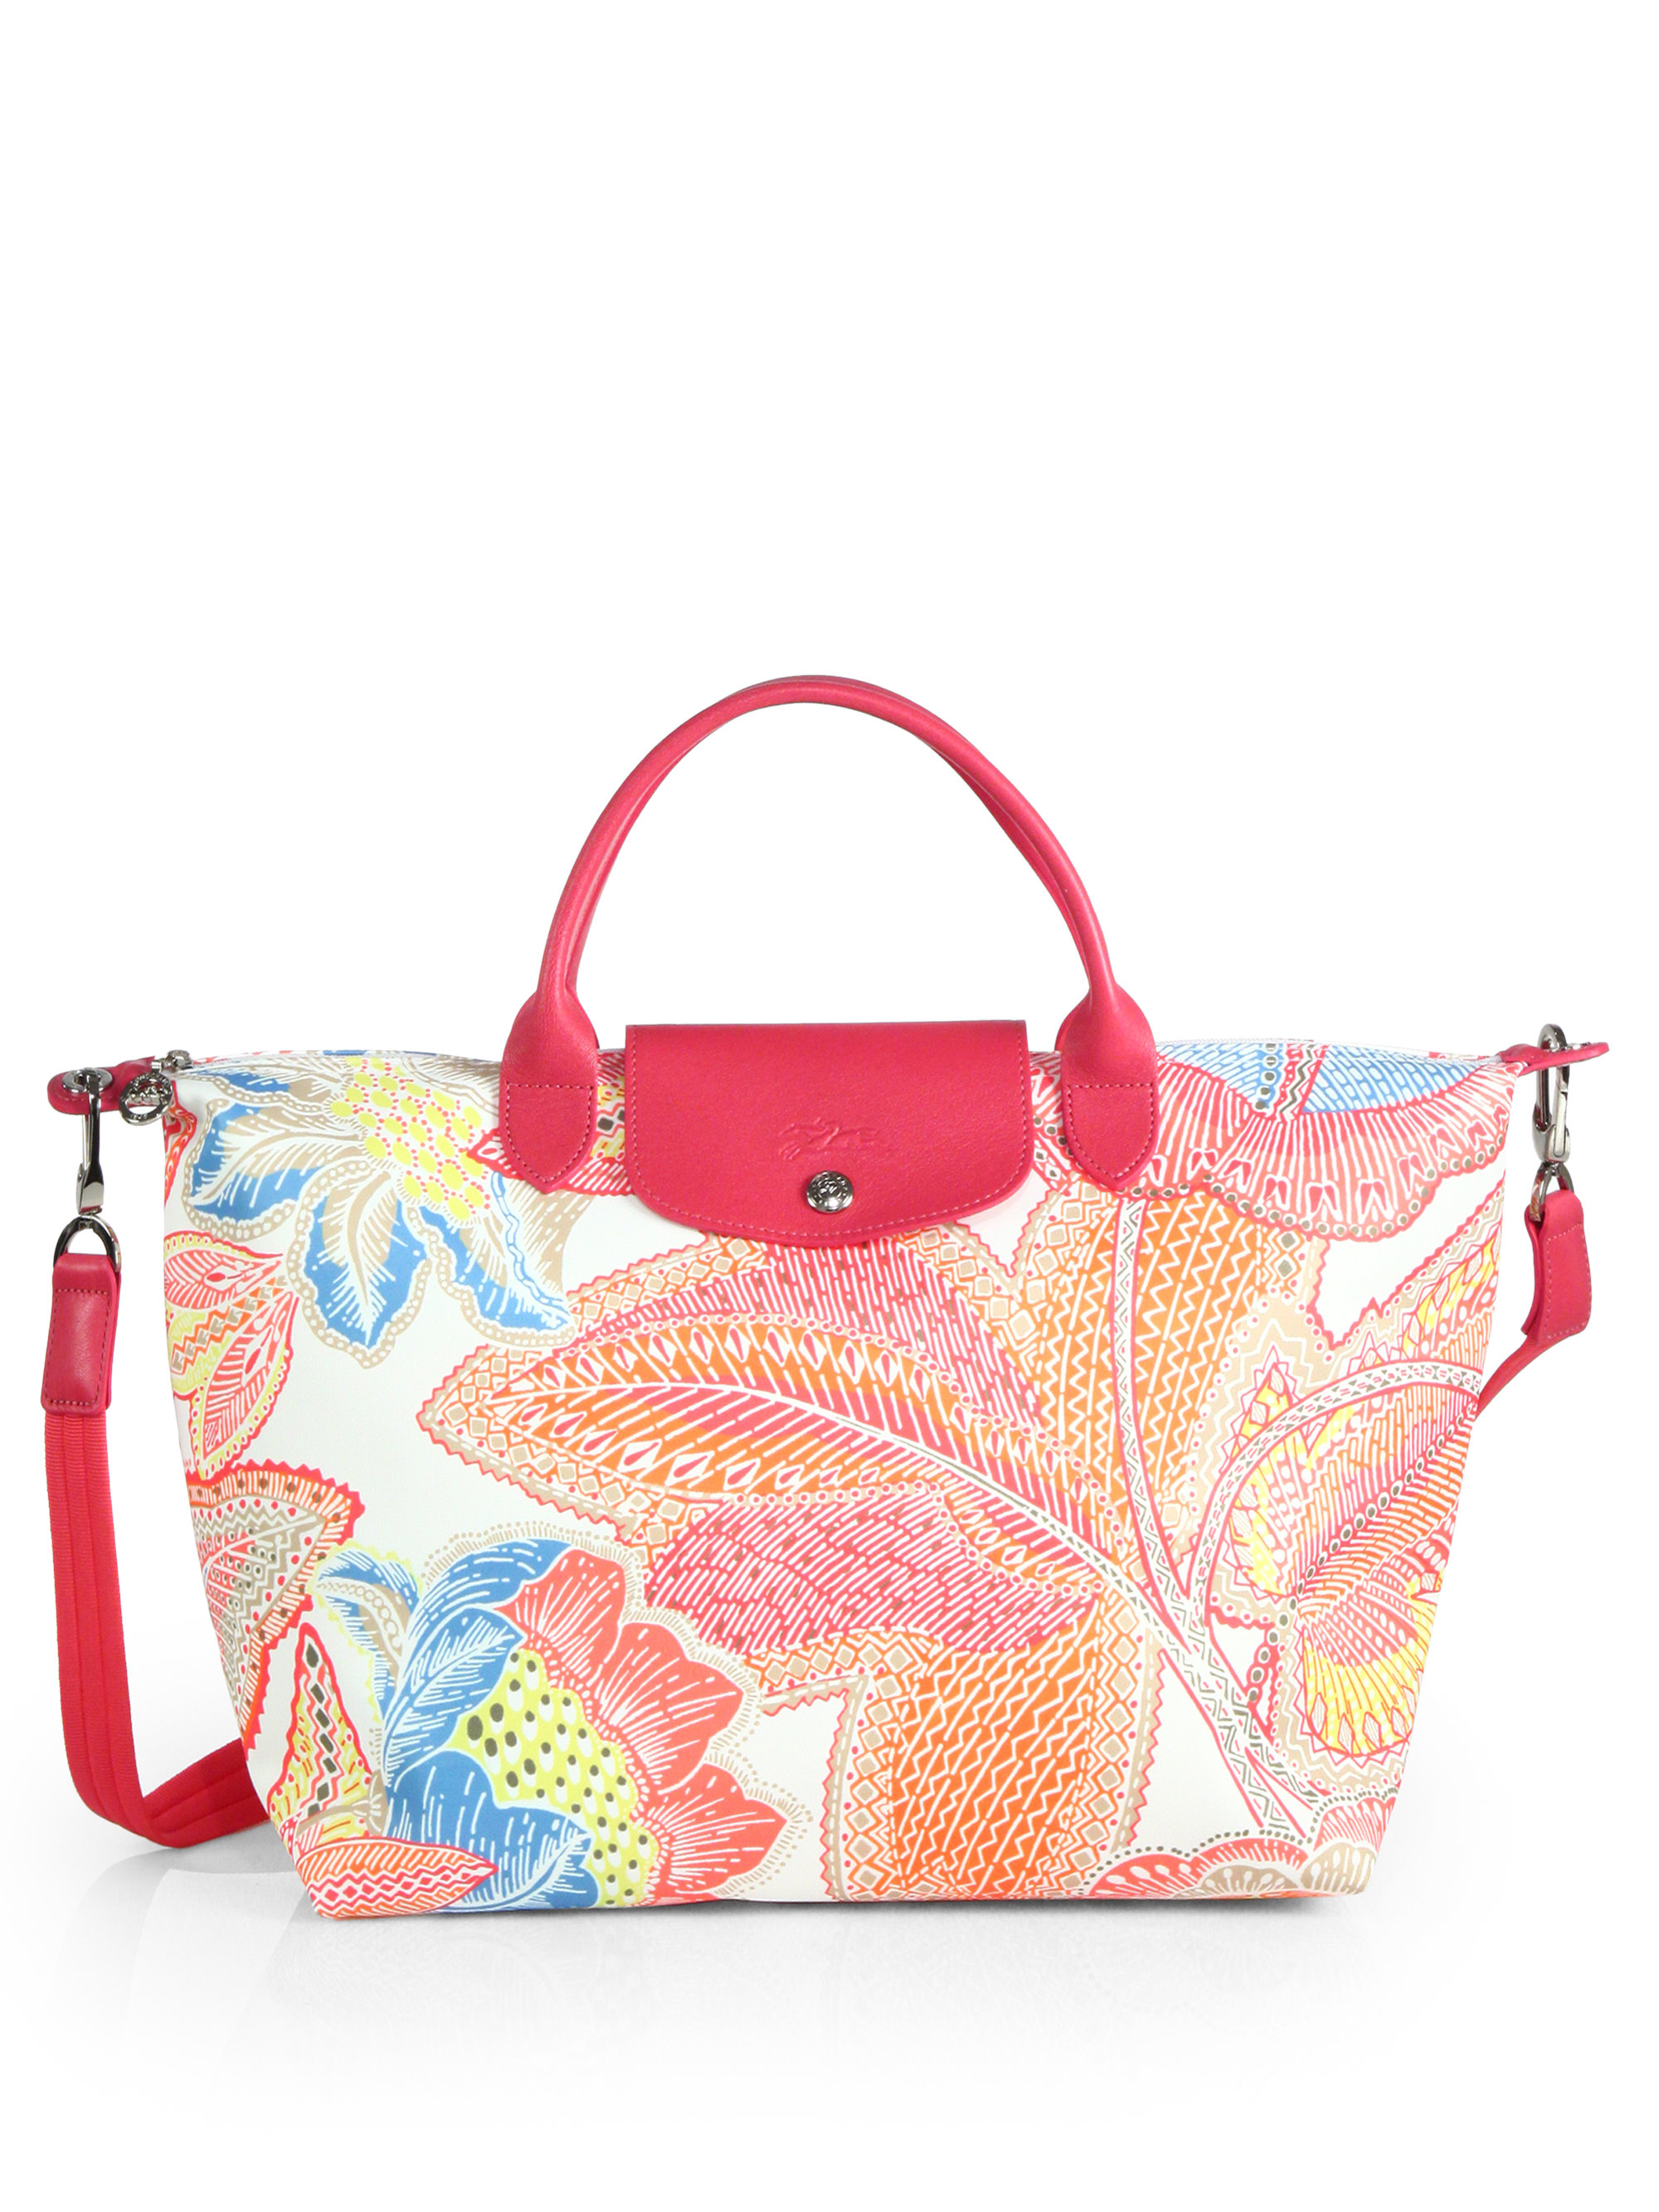 bd08cd8c027 Longchamp Fleurs Medium Printed Nylon Bag in Pink - Lyst